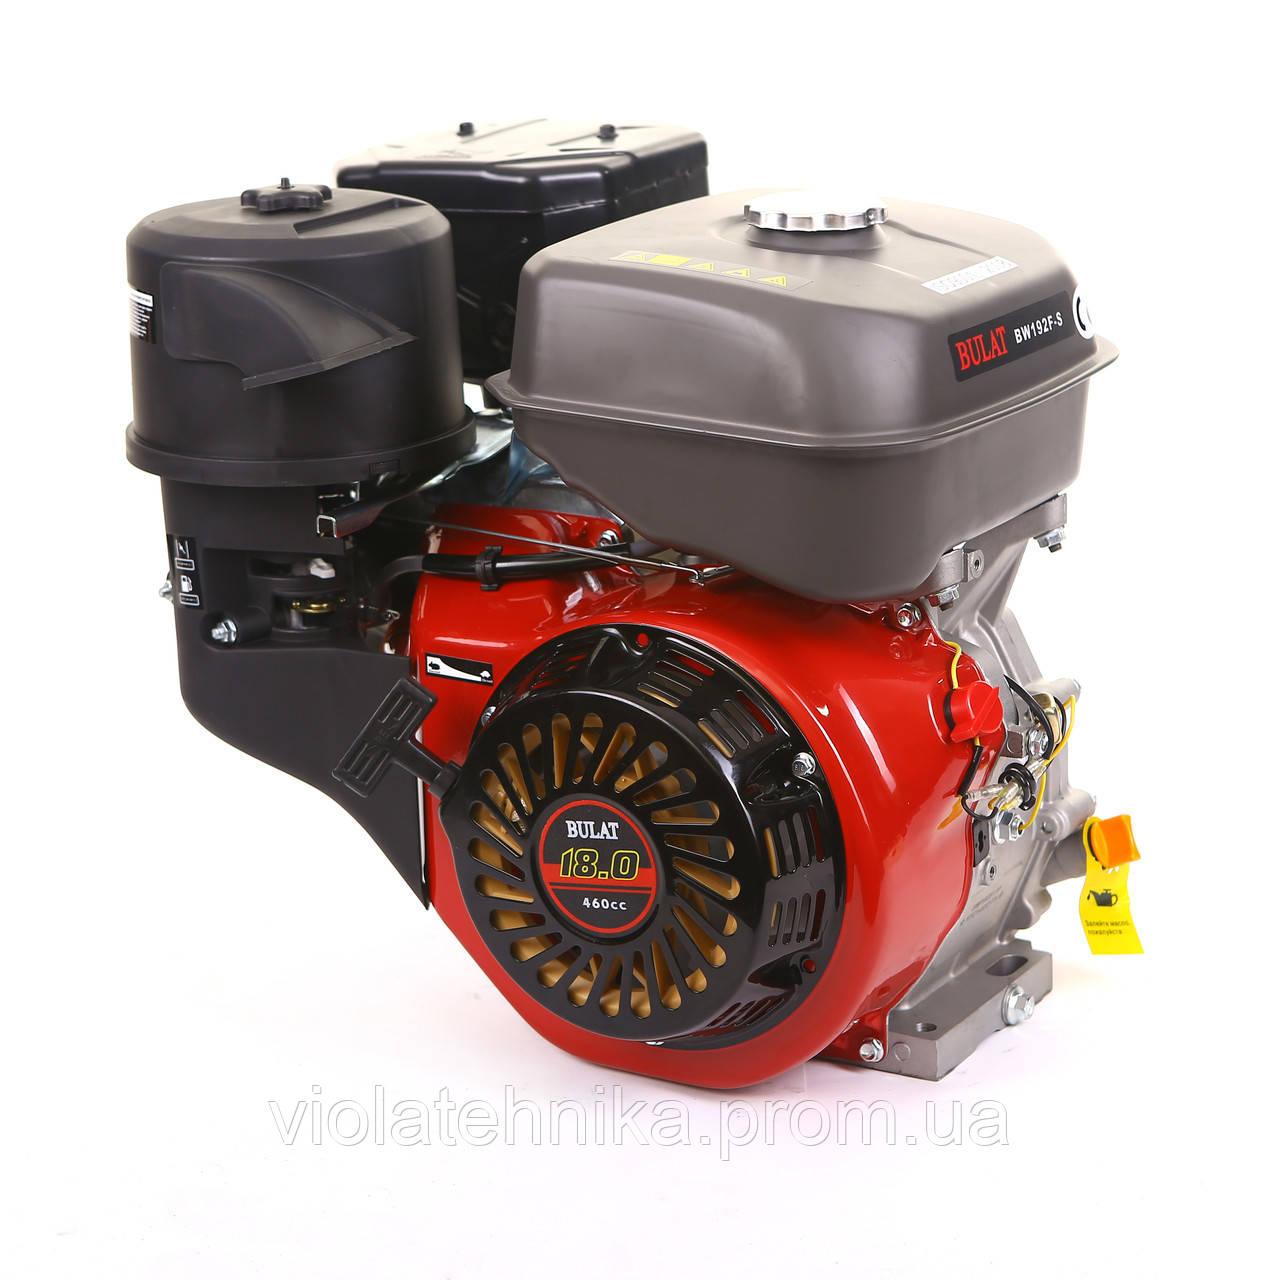 Двигатель бензиновый BULAT BW192F-S шпонка, 18 л.с., ручн. стартер